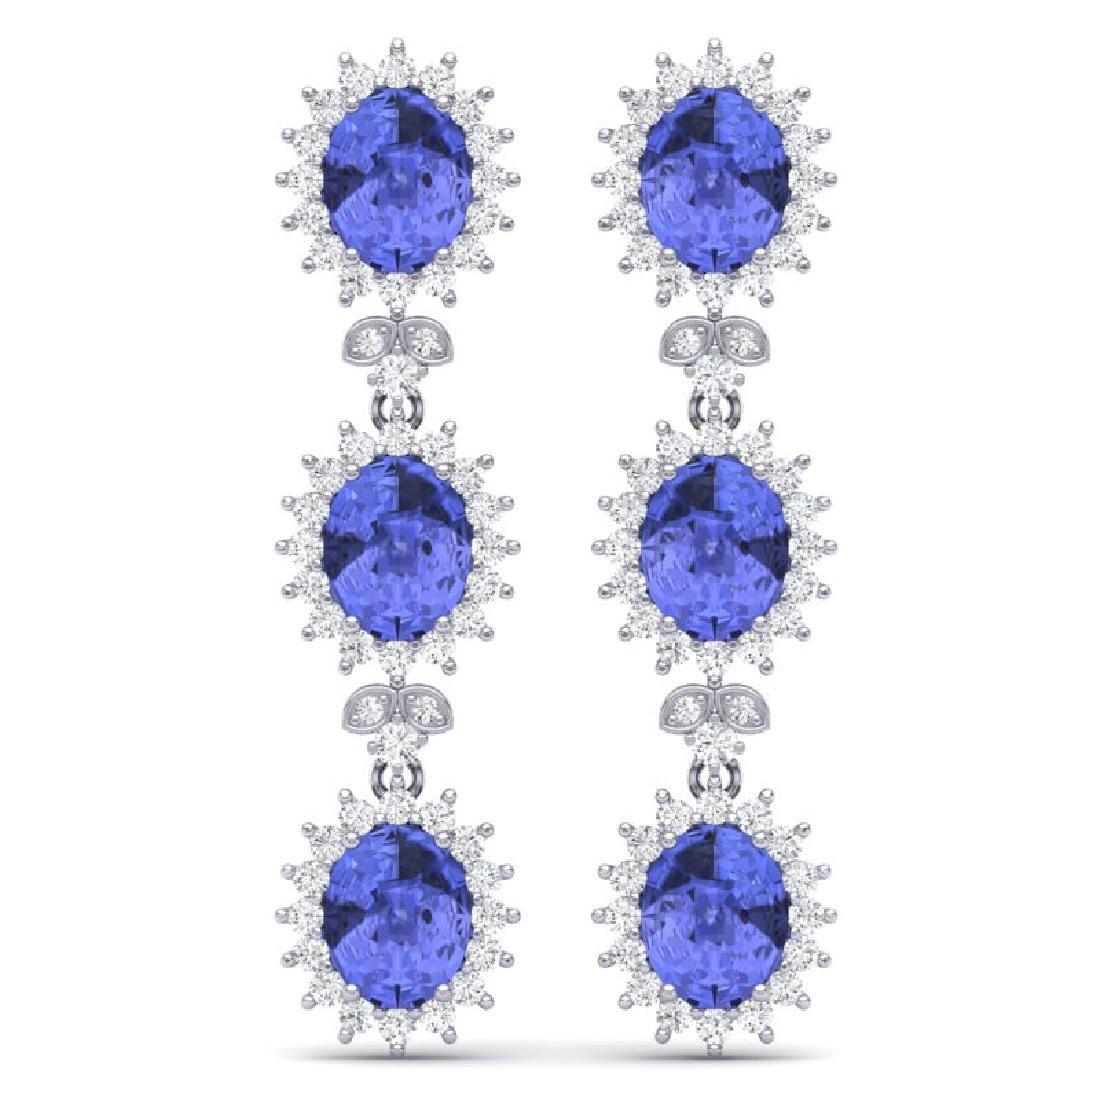 25.36 CTW Royalty Tanzanite & VS Diamond Earrings 18K